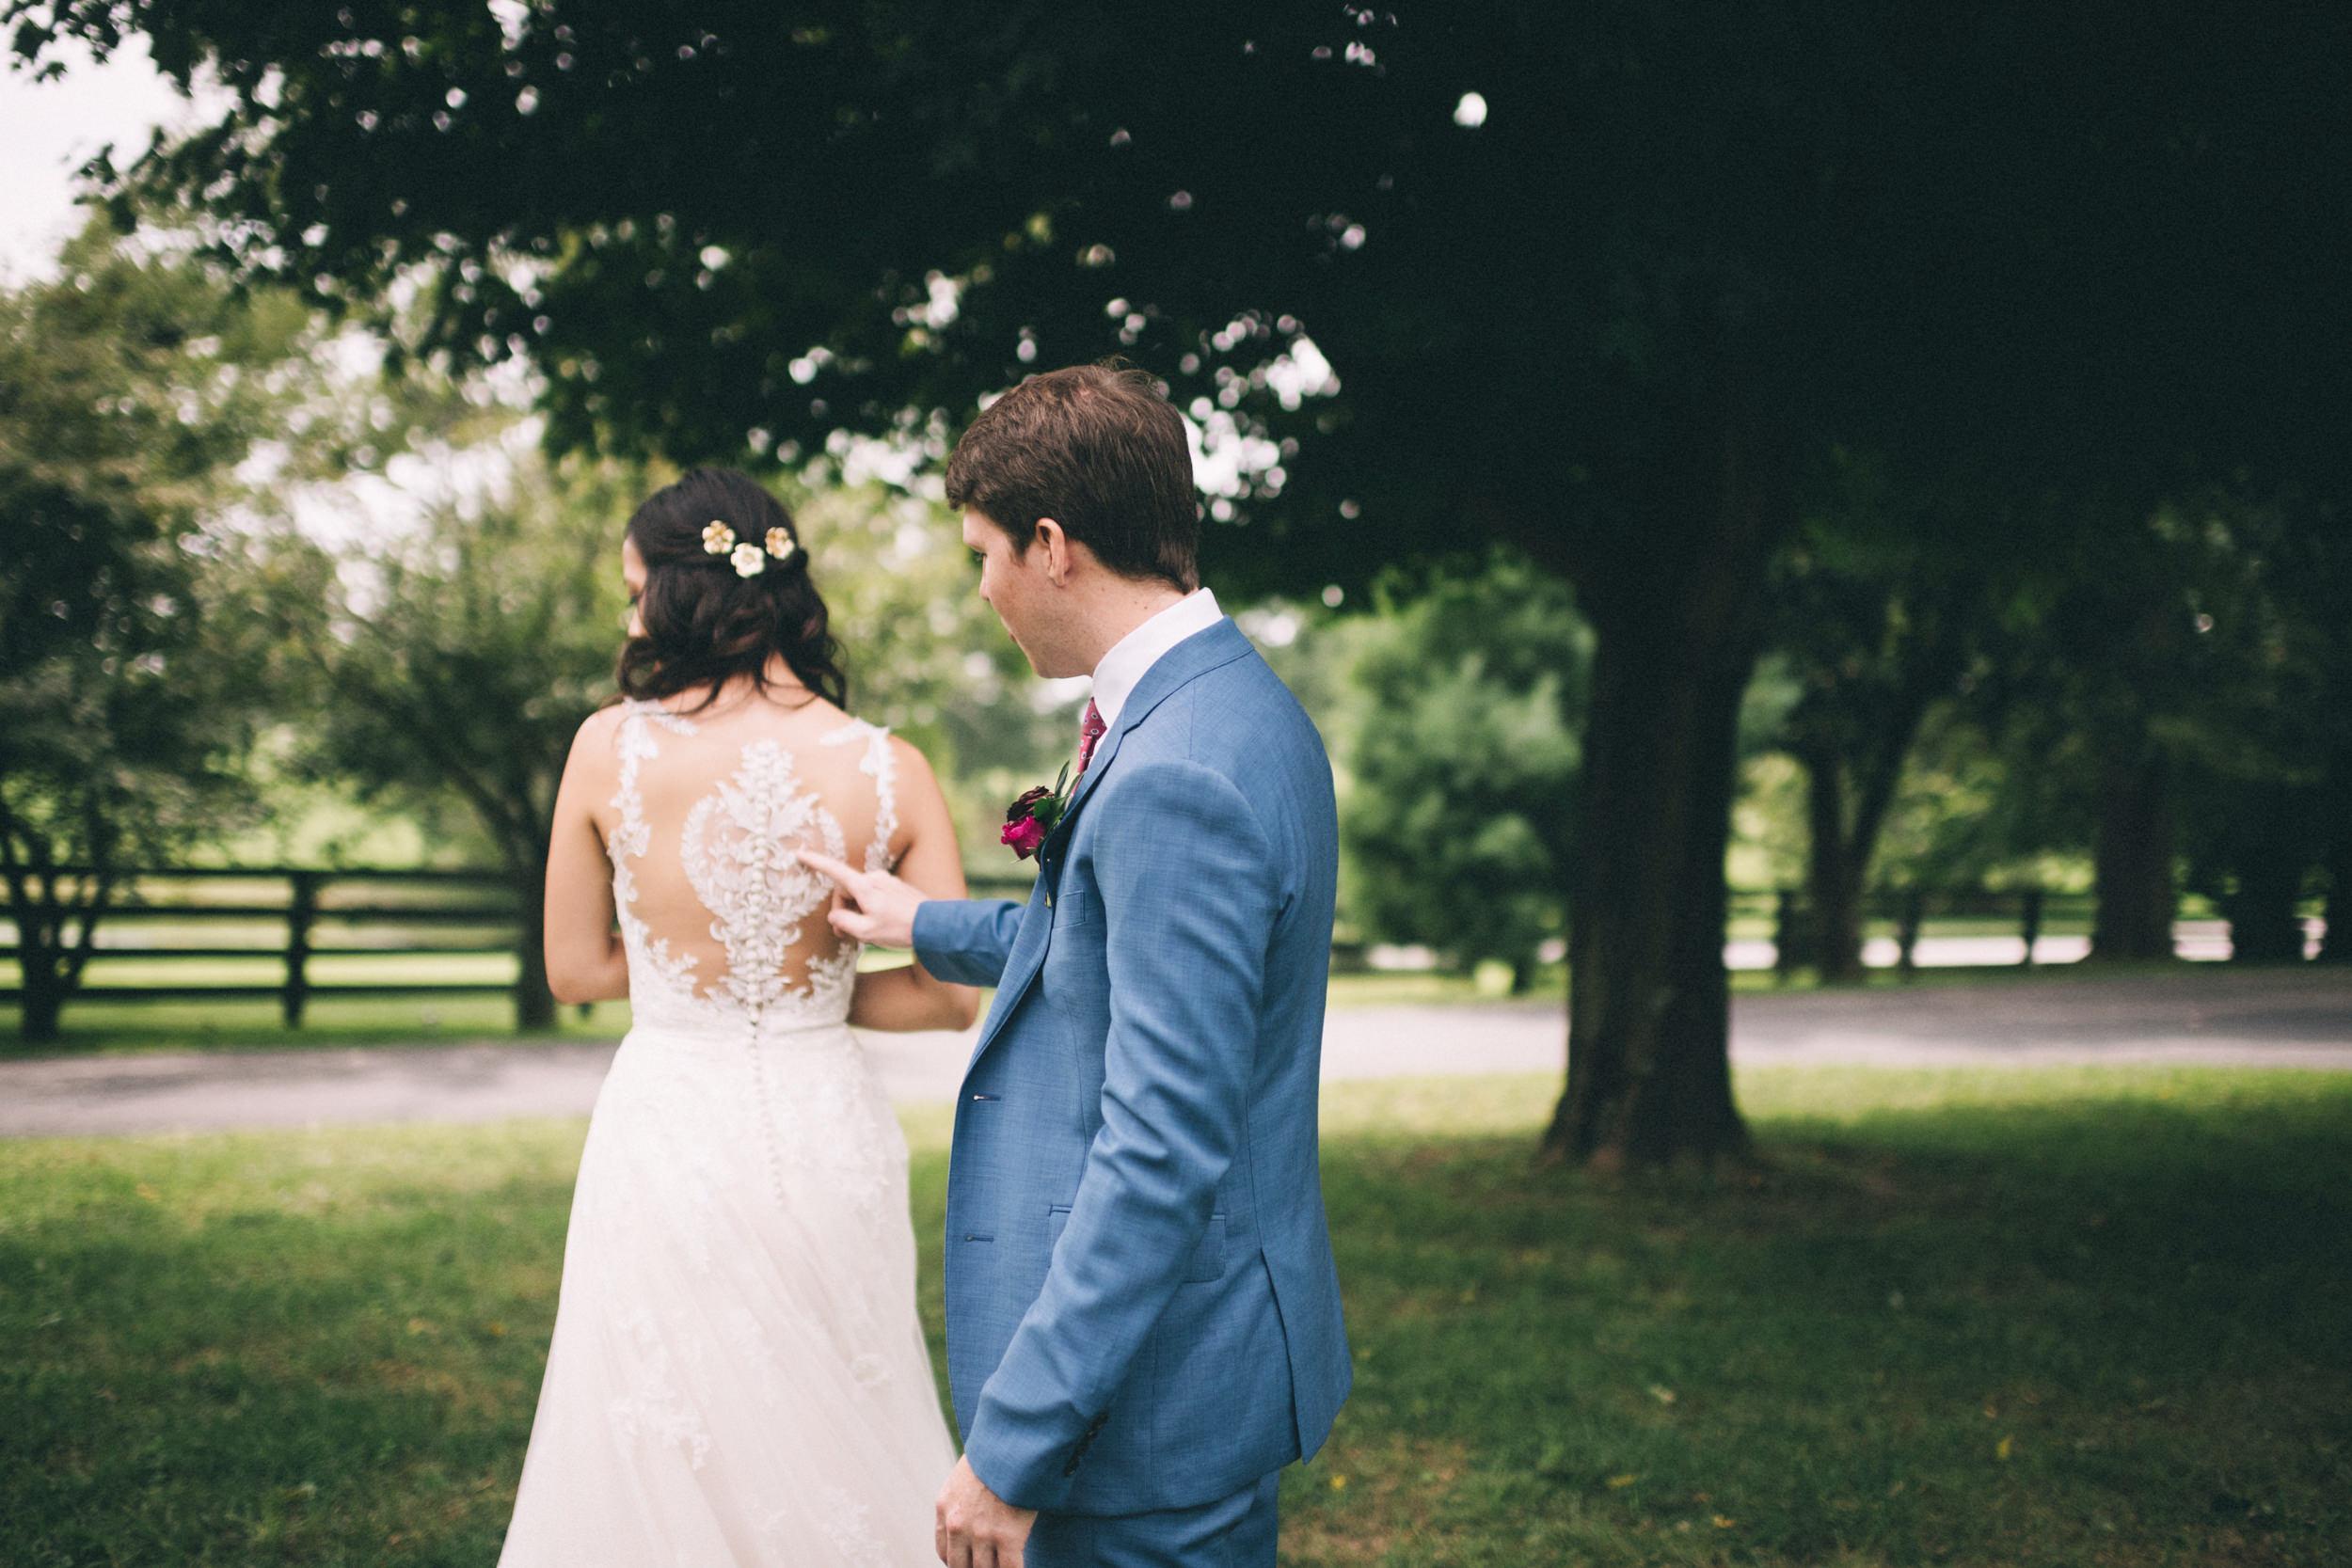 Louisville-Kentucky-Wedding-and-Elopement-Photographer-Sarah-Katherine-Davis-Photography-Summer-Jewel-Toned-Wedding-Chineese-Tea-Ceremony-Warrenwood-Manor-Danville-178.jpg